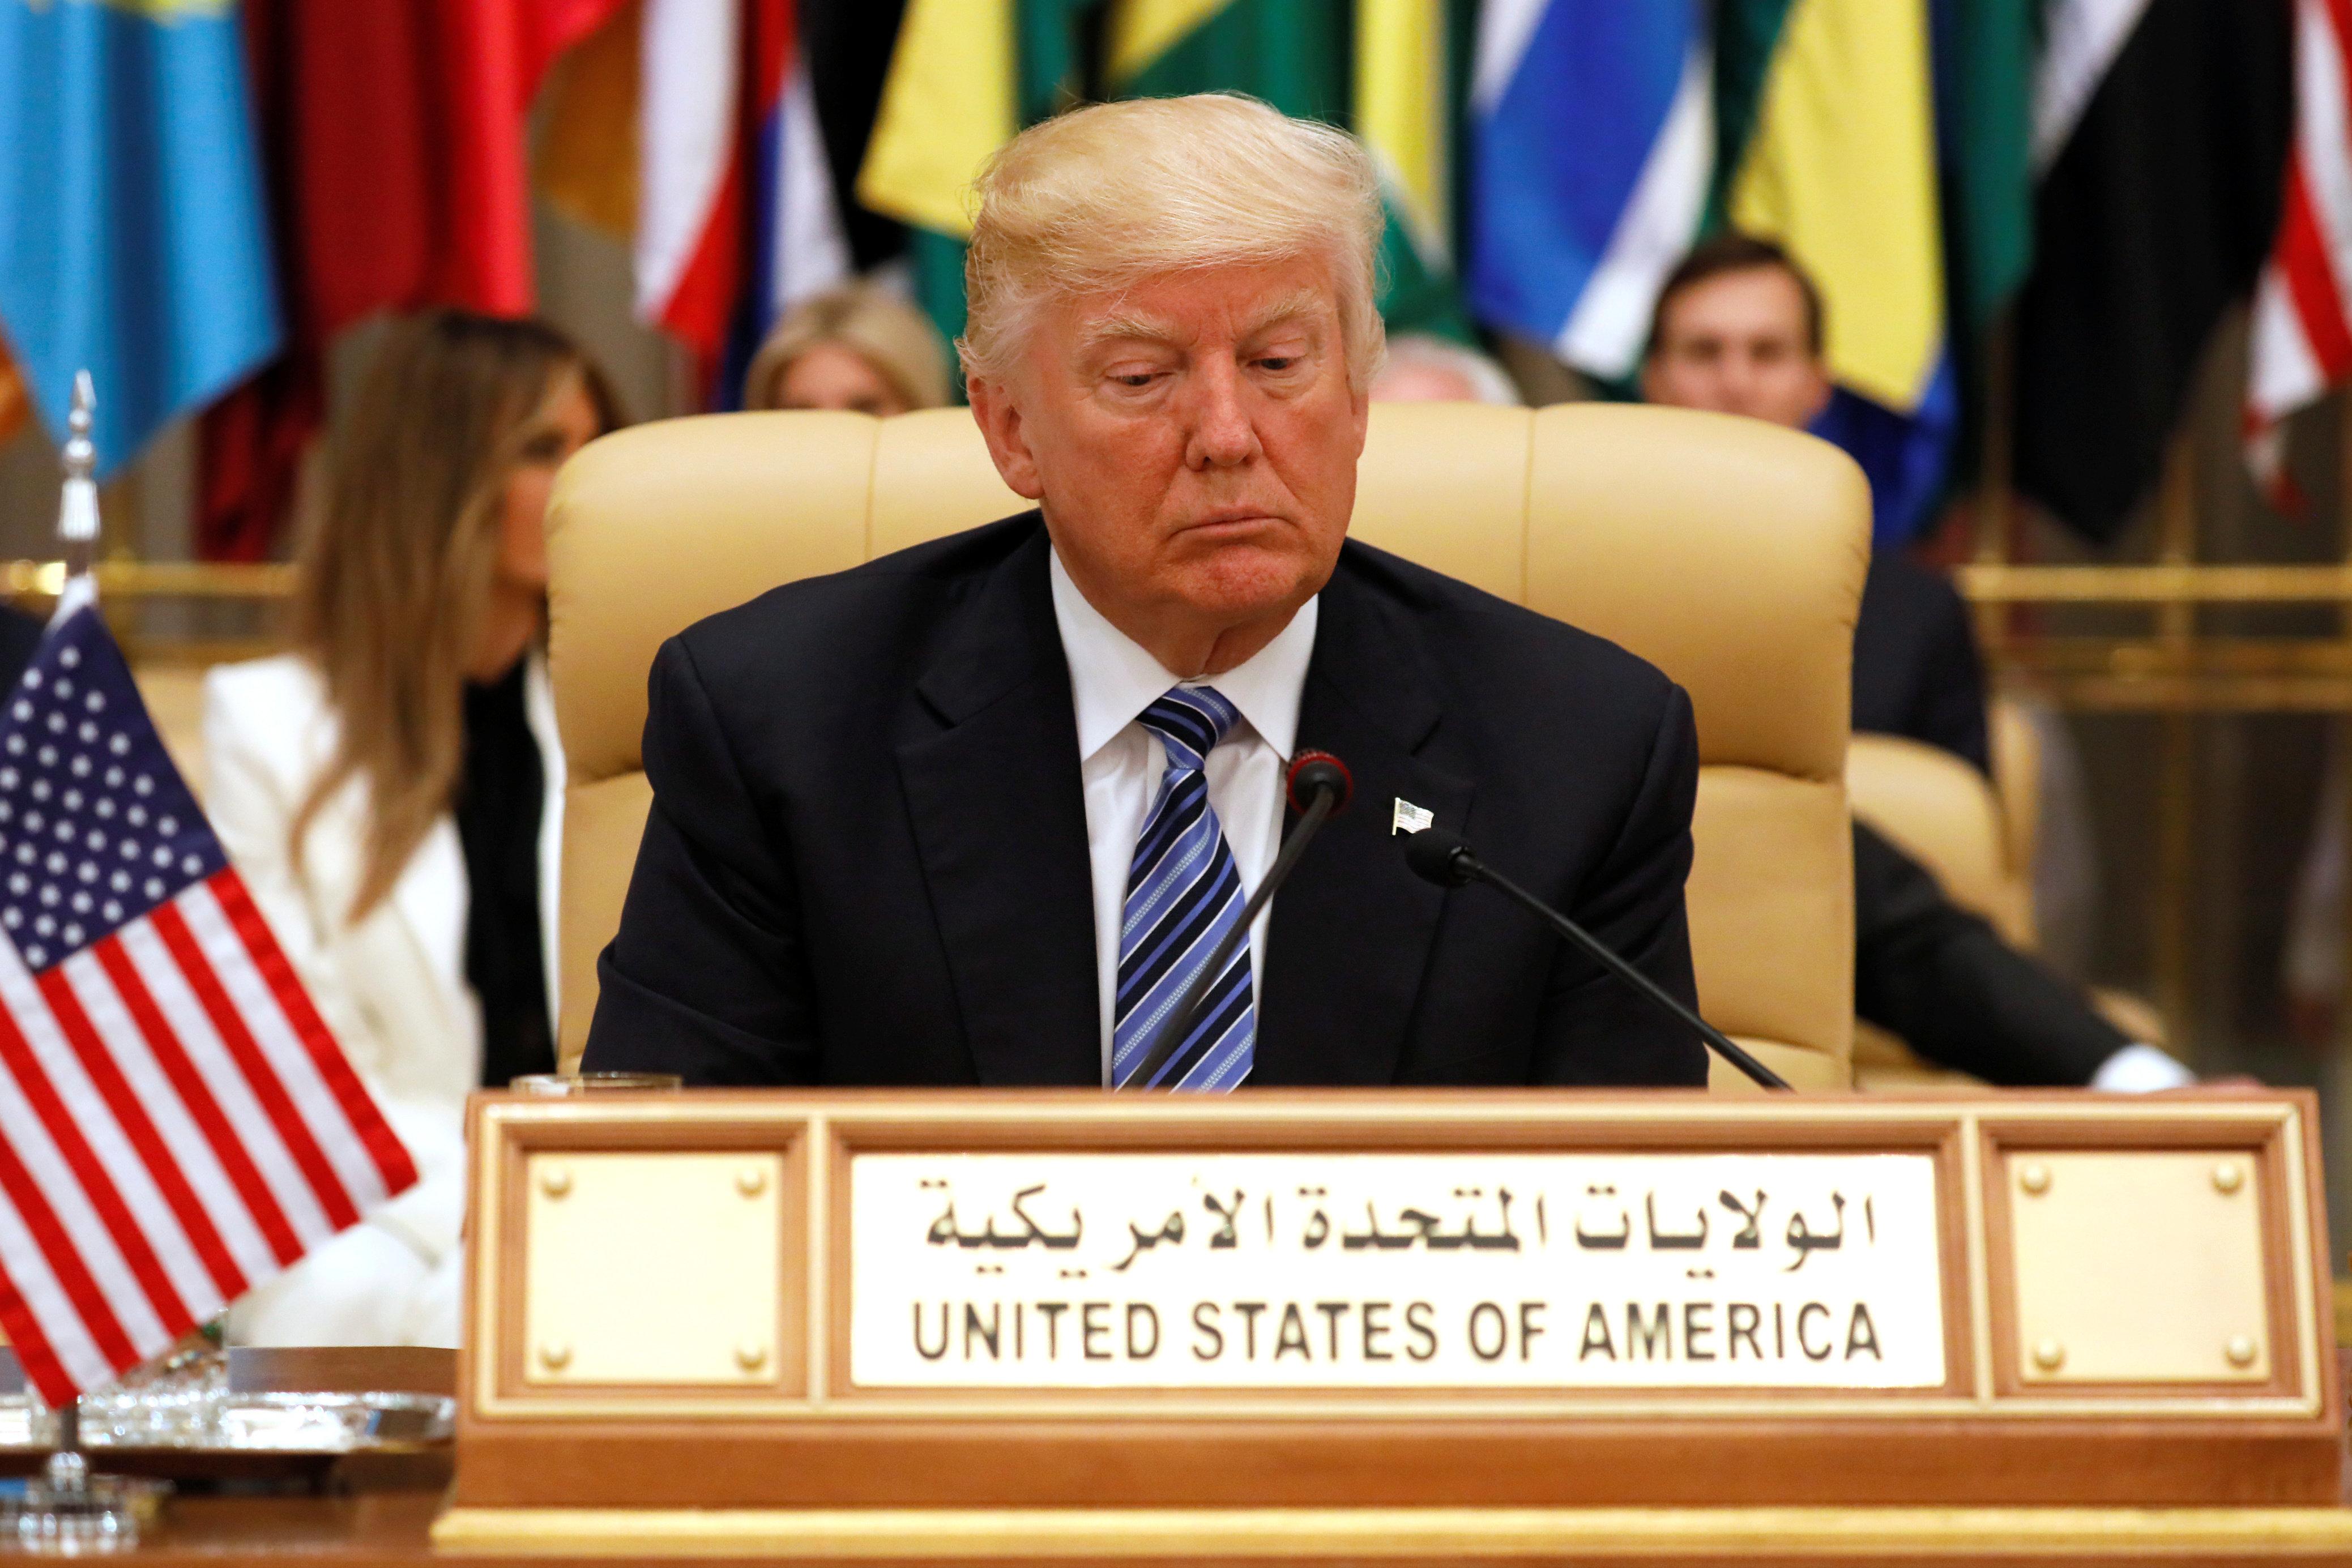 While in Riyadh, Trump endorsed the Saudi line, makingIran the focus of his anti-terrorism rhetoric.